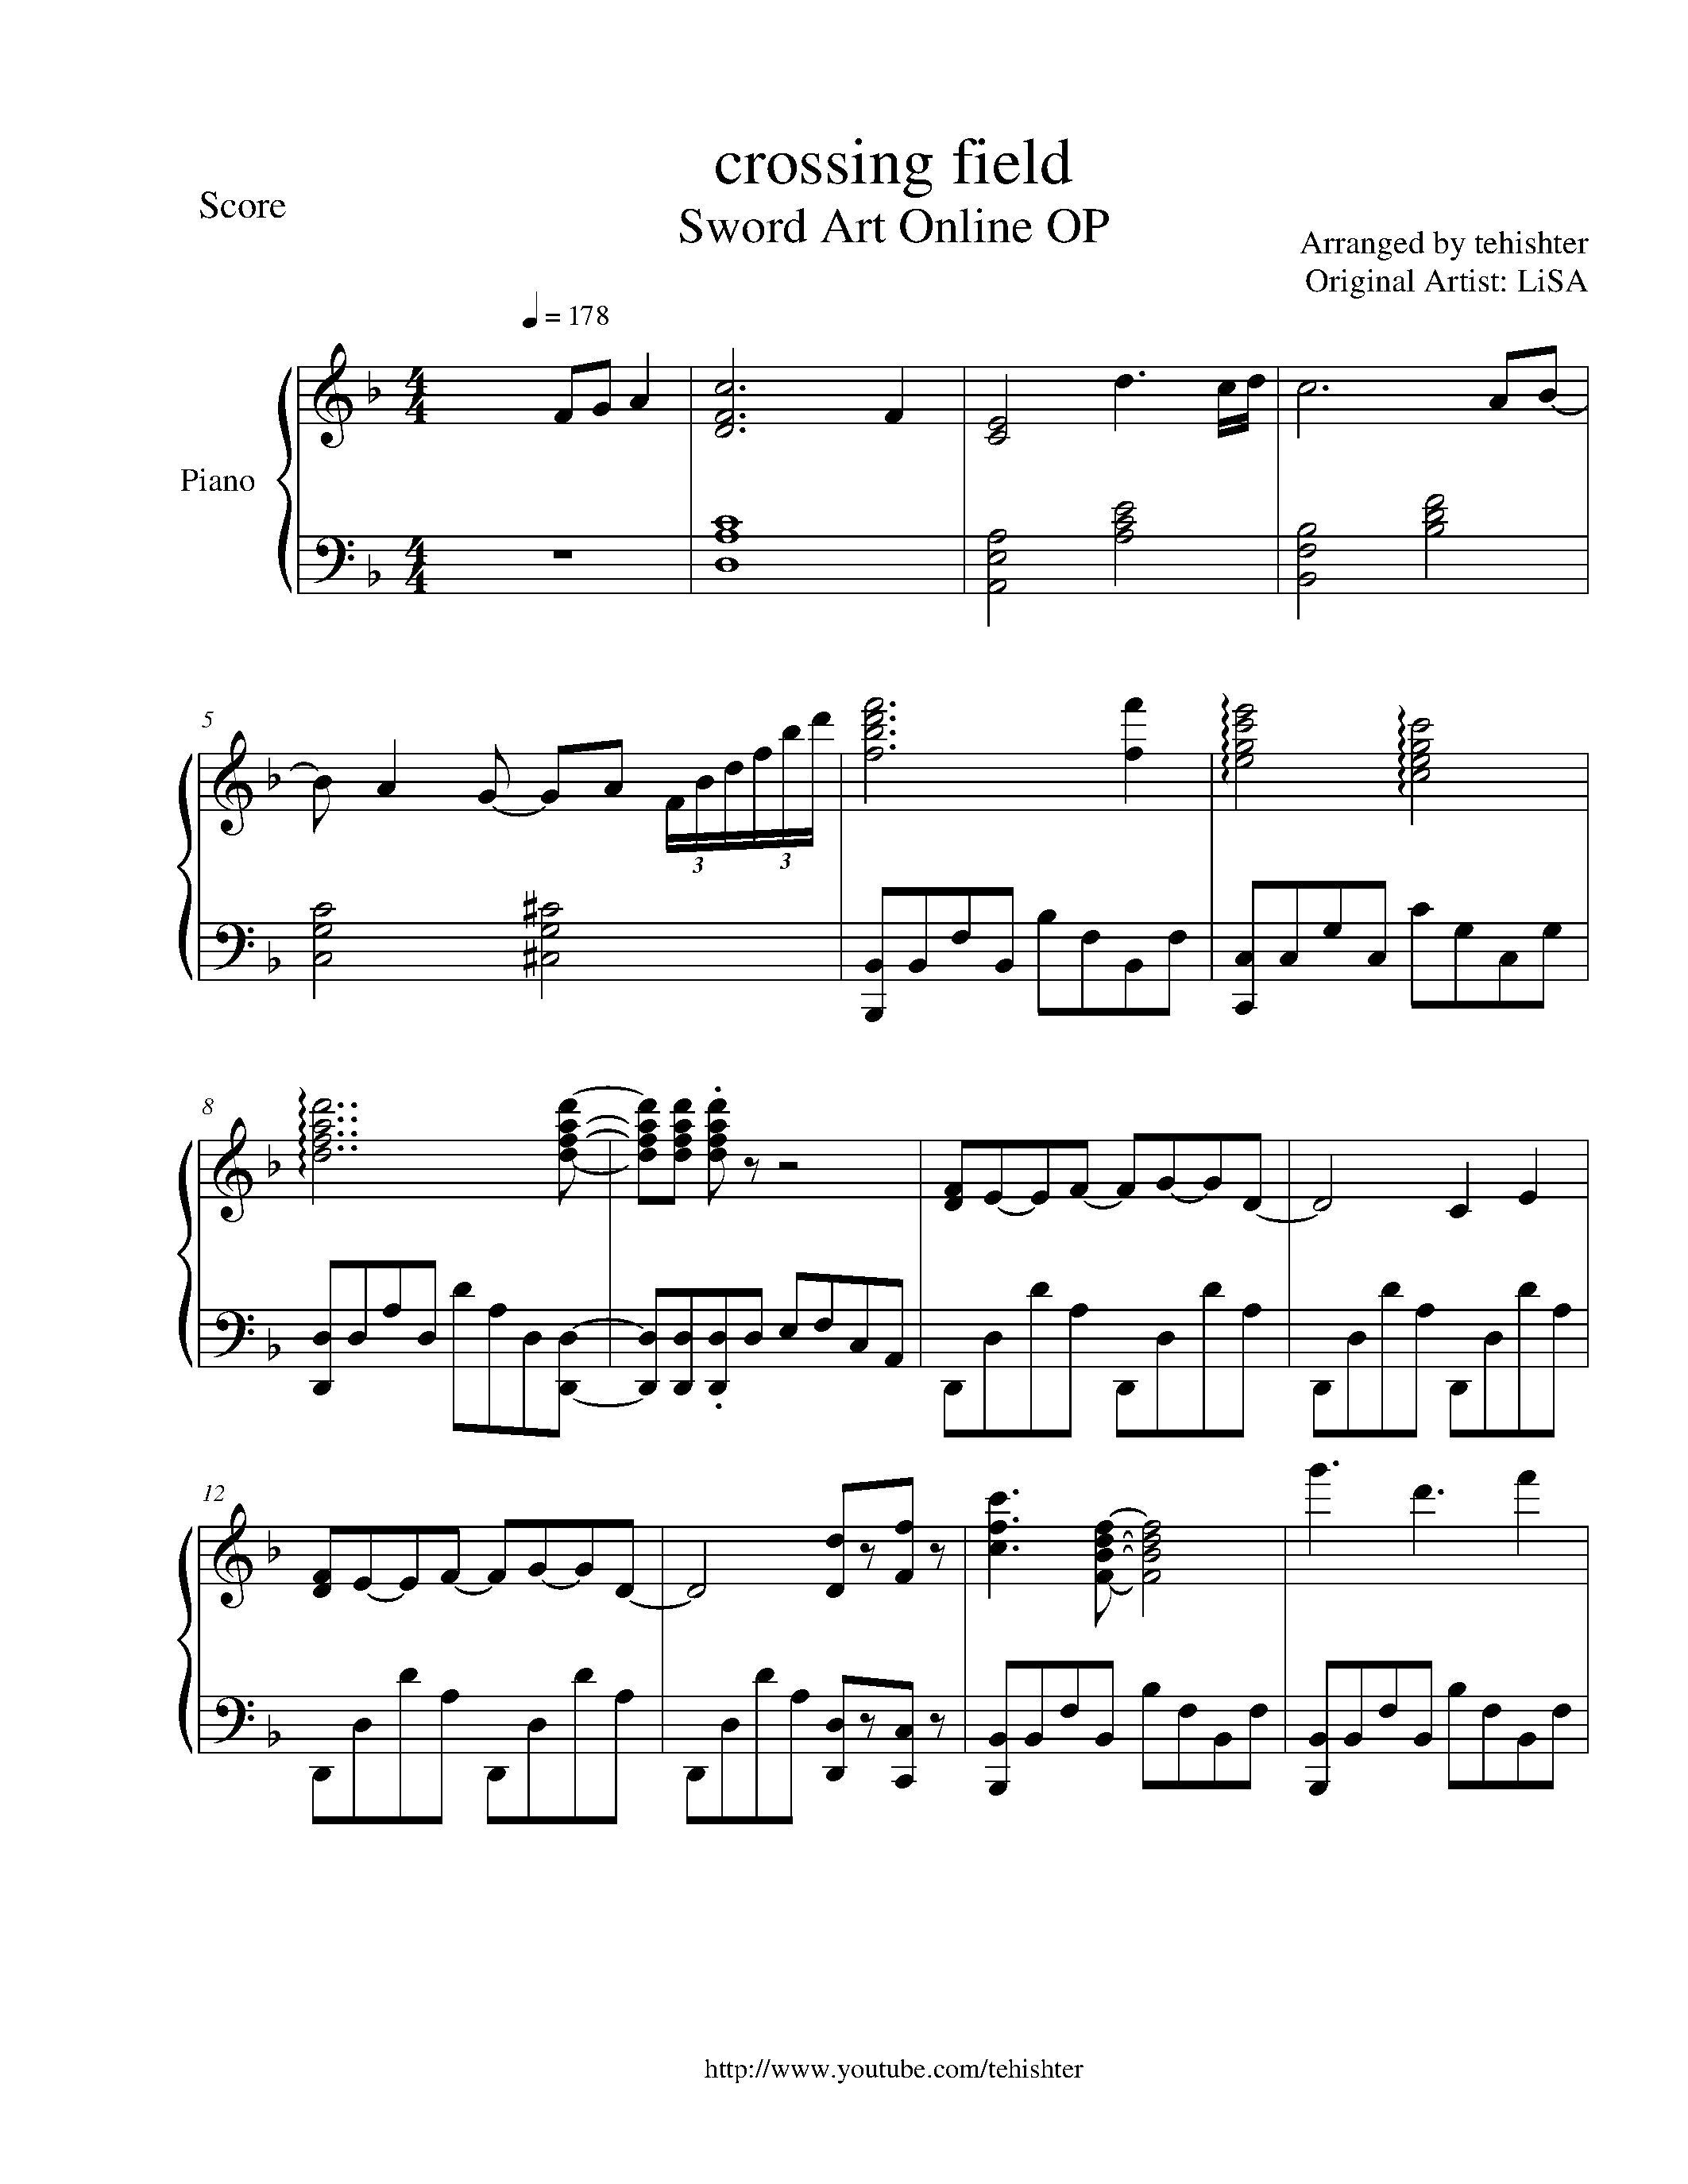 SAO - Crossing Field Piano Sheet Music !!!! <3 | ~Music~ | Pinterest ...